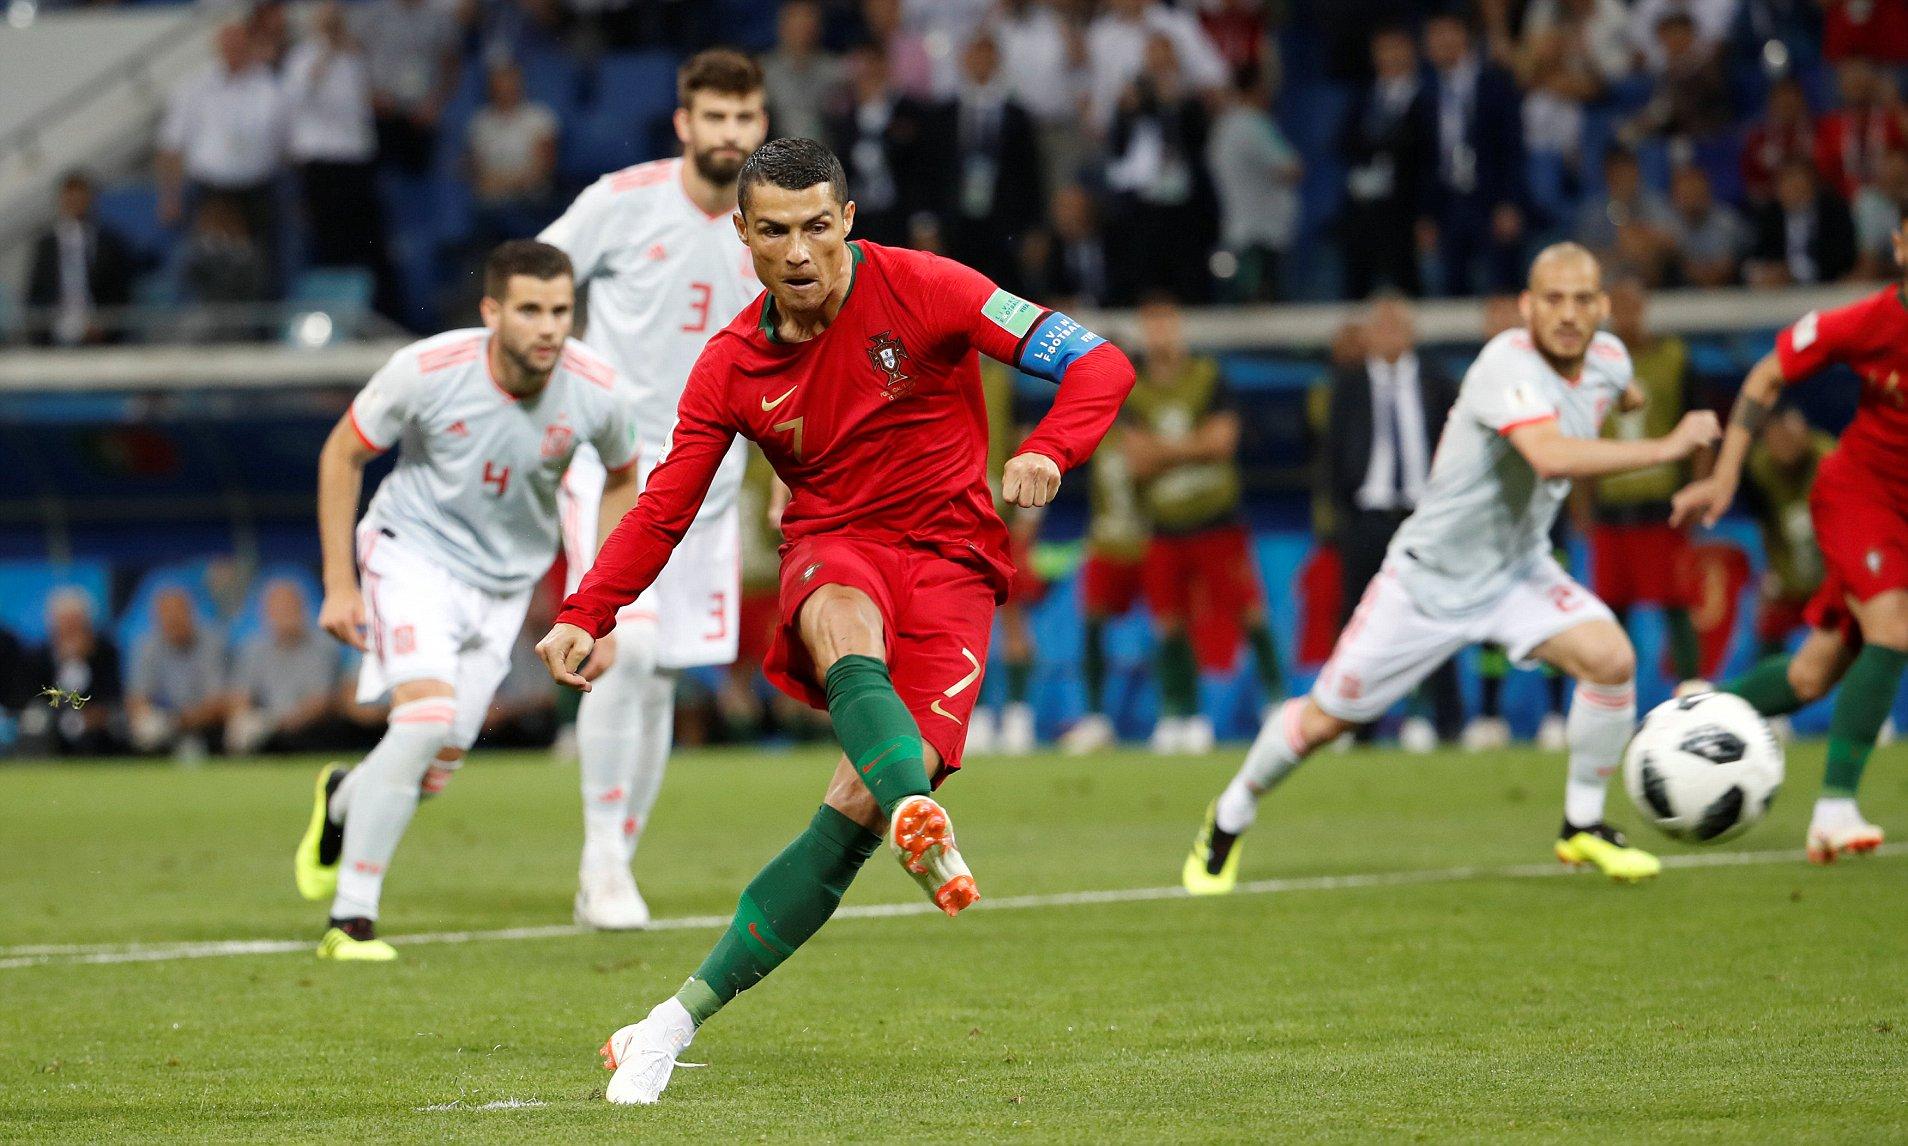 स्पेन र पोर्चुगलले मैत्रीपूर्ण खेल खेल्ने घोषणा